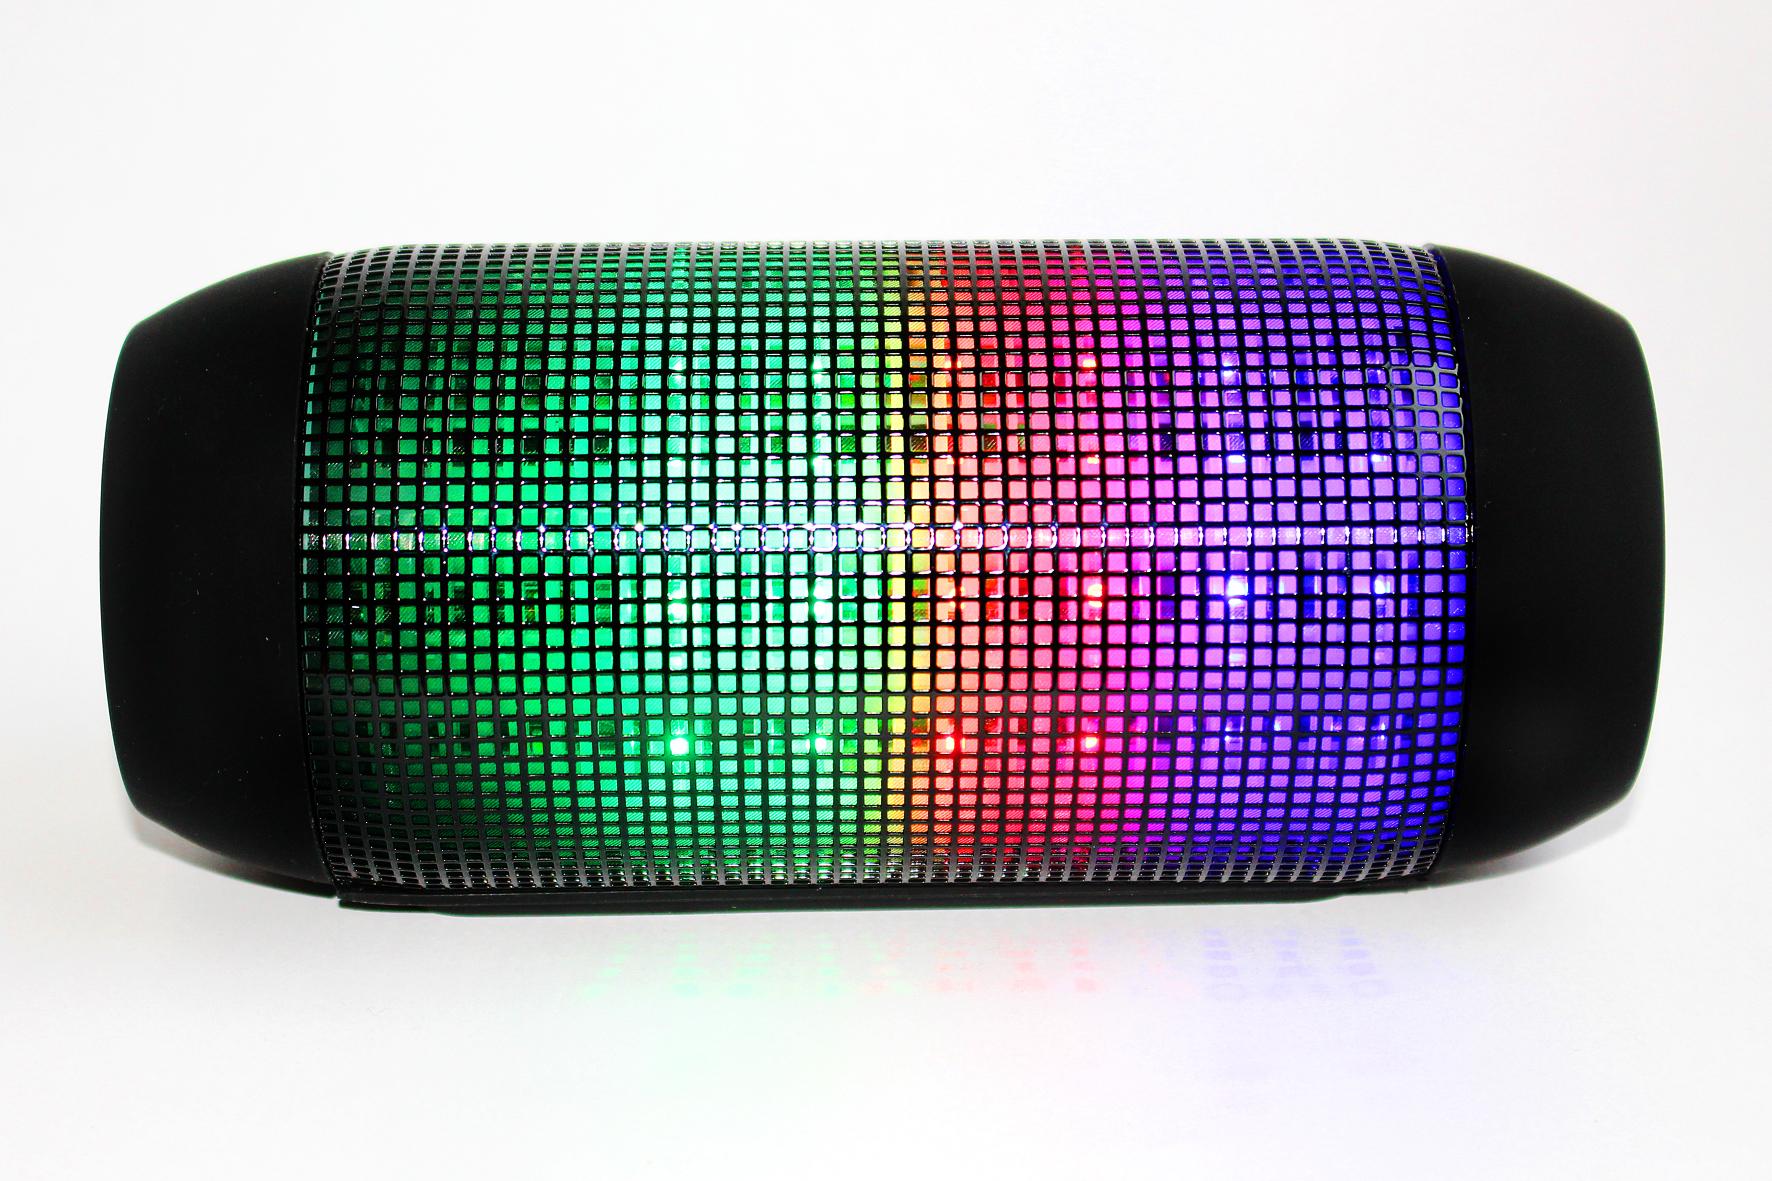 bluetooth pulse lautsprecher wireless speaker soundbox radio sd usb aux ebay. Black Bedroom Furniture Sets. Home Design Ideas